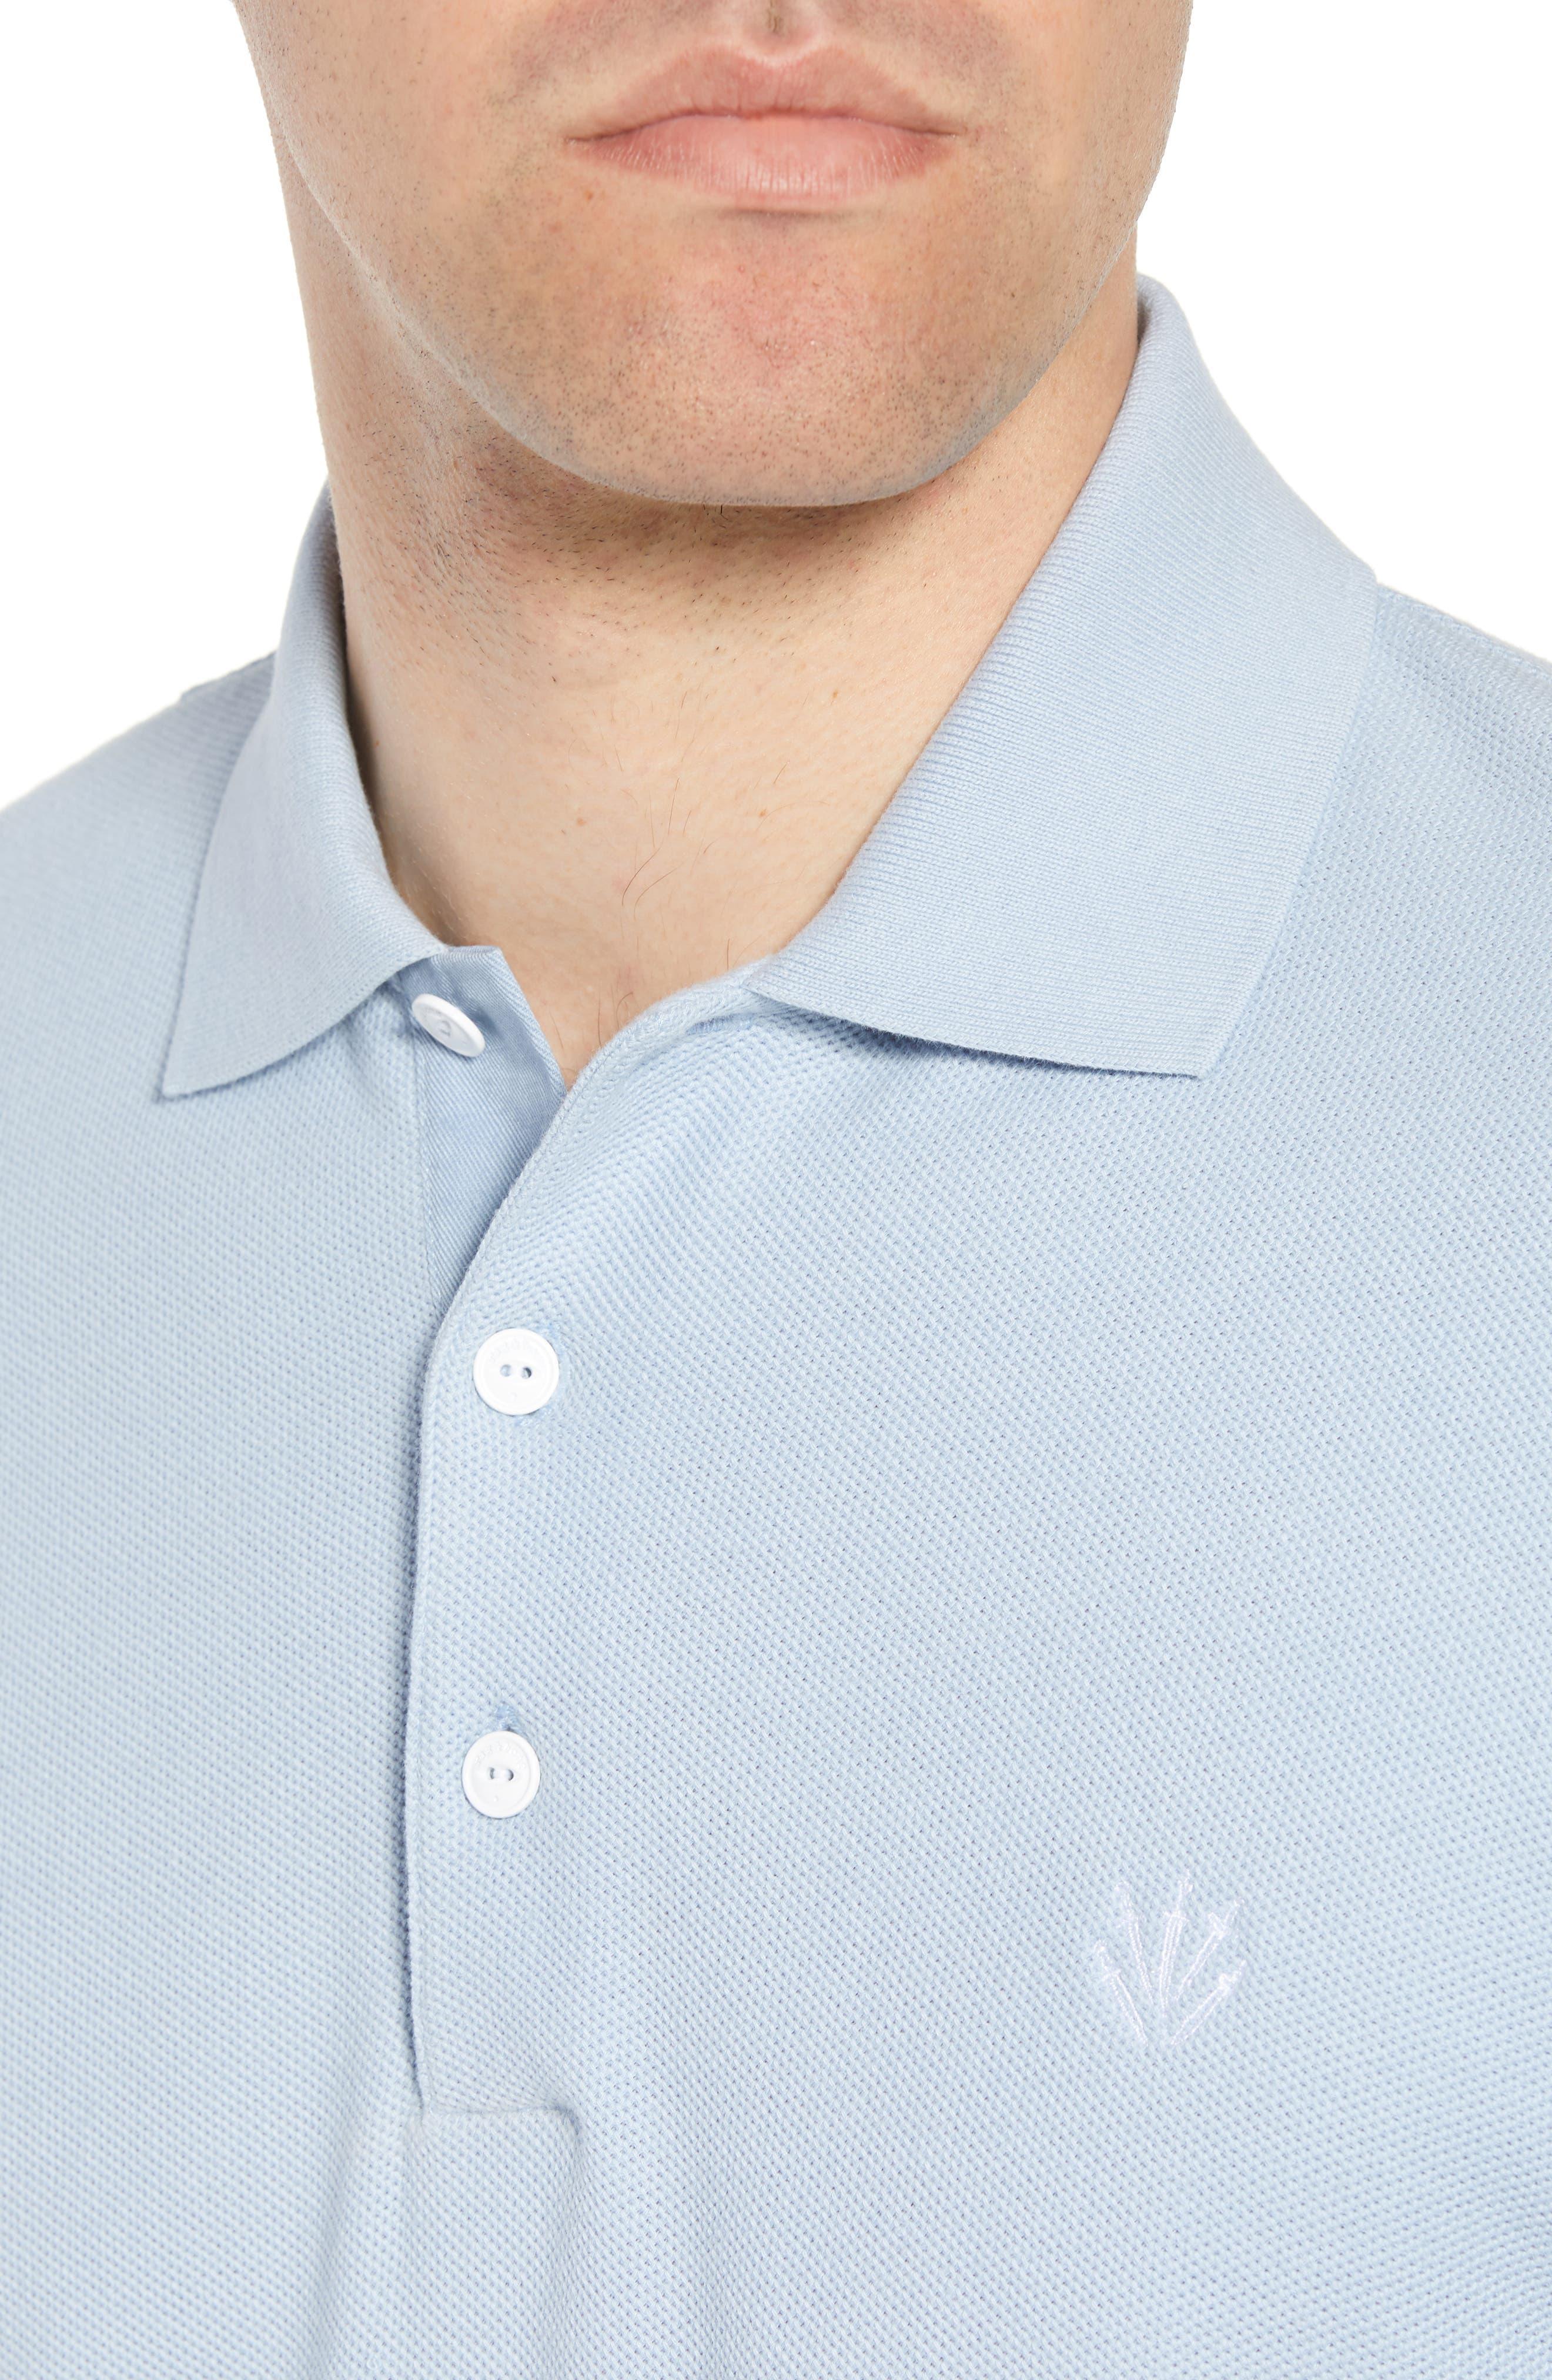 Regular Fit Polo,                             Alternate thumbnail 4, color,                             400